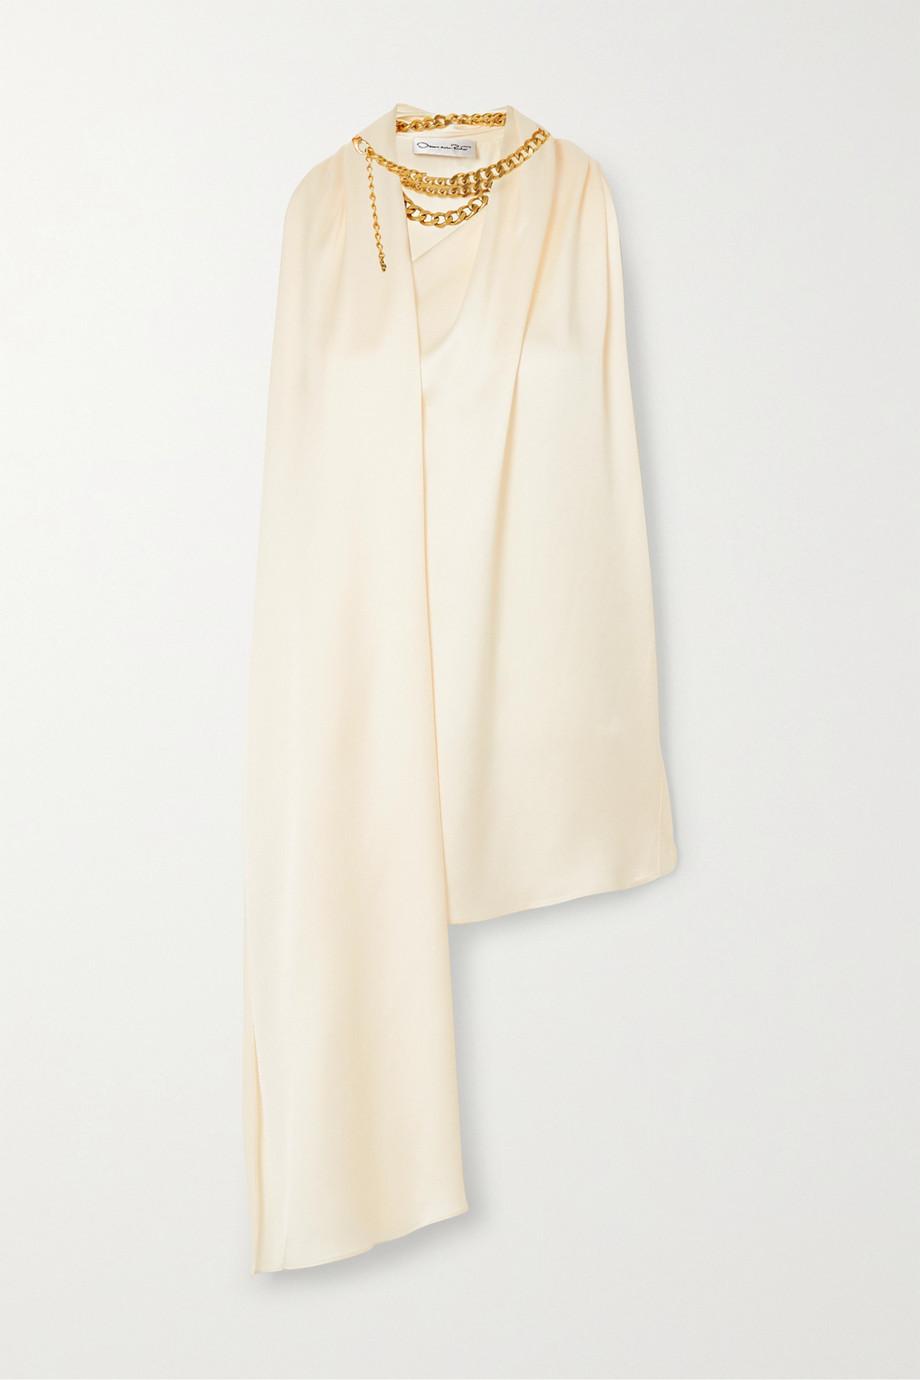 Oscar de la Renta Chain-embellished draped satin-crepe top